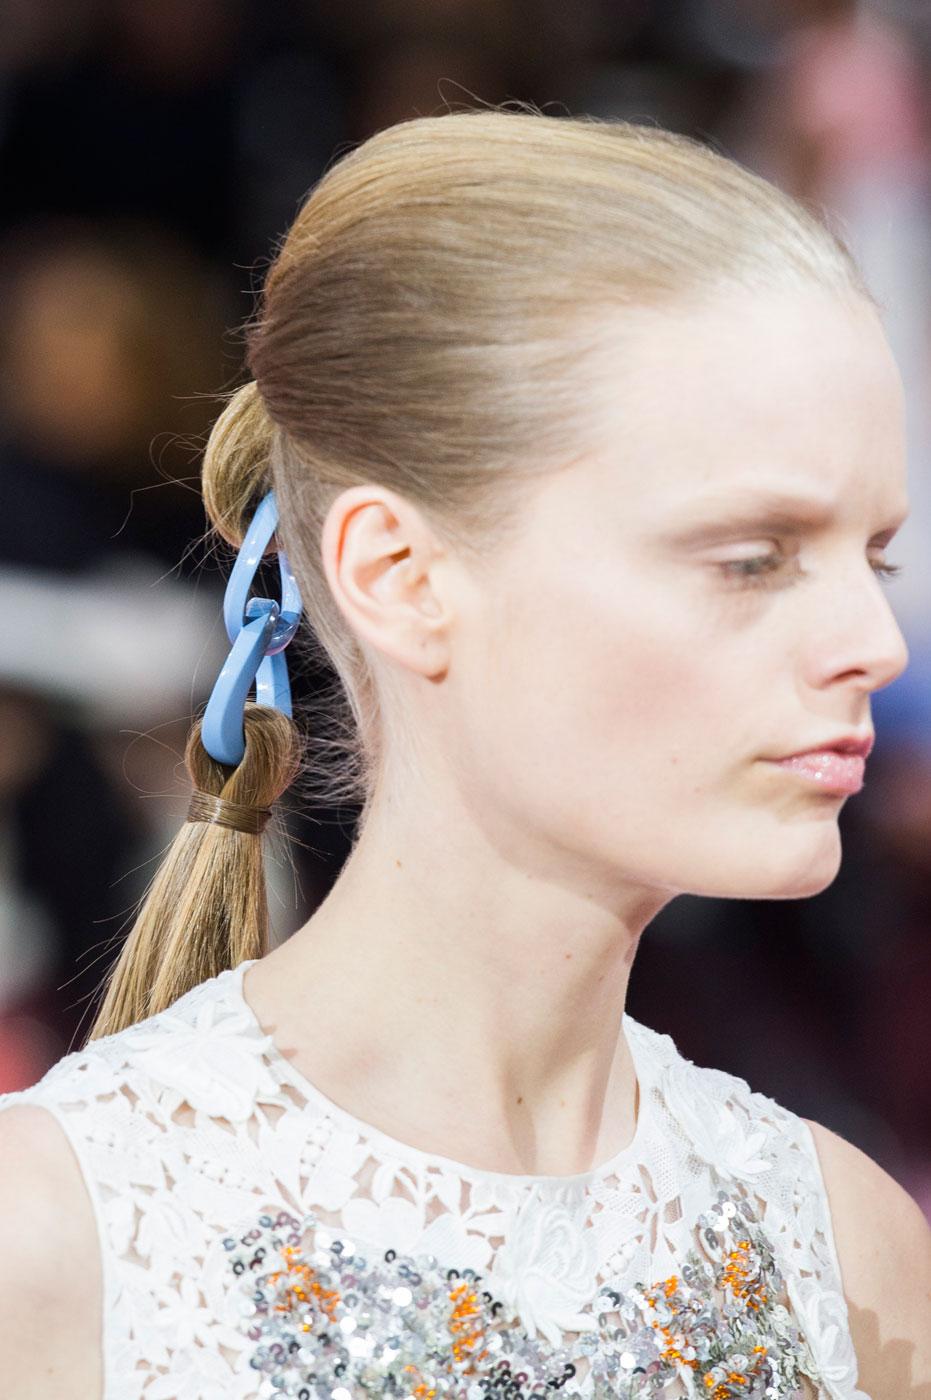 Christian-Dior-fashion-runway-show-close-ups-haute-couture-paris-spring-summer-2015-the-impression-194